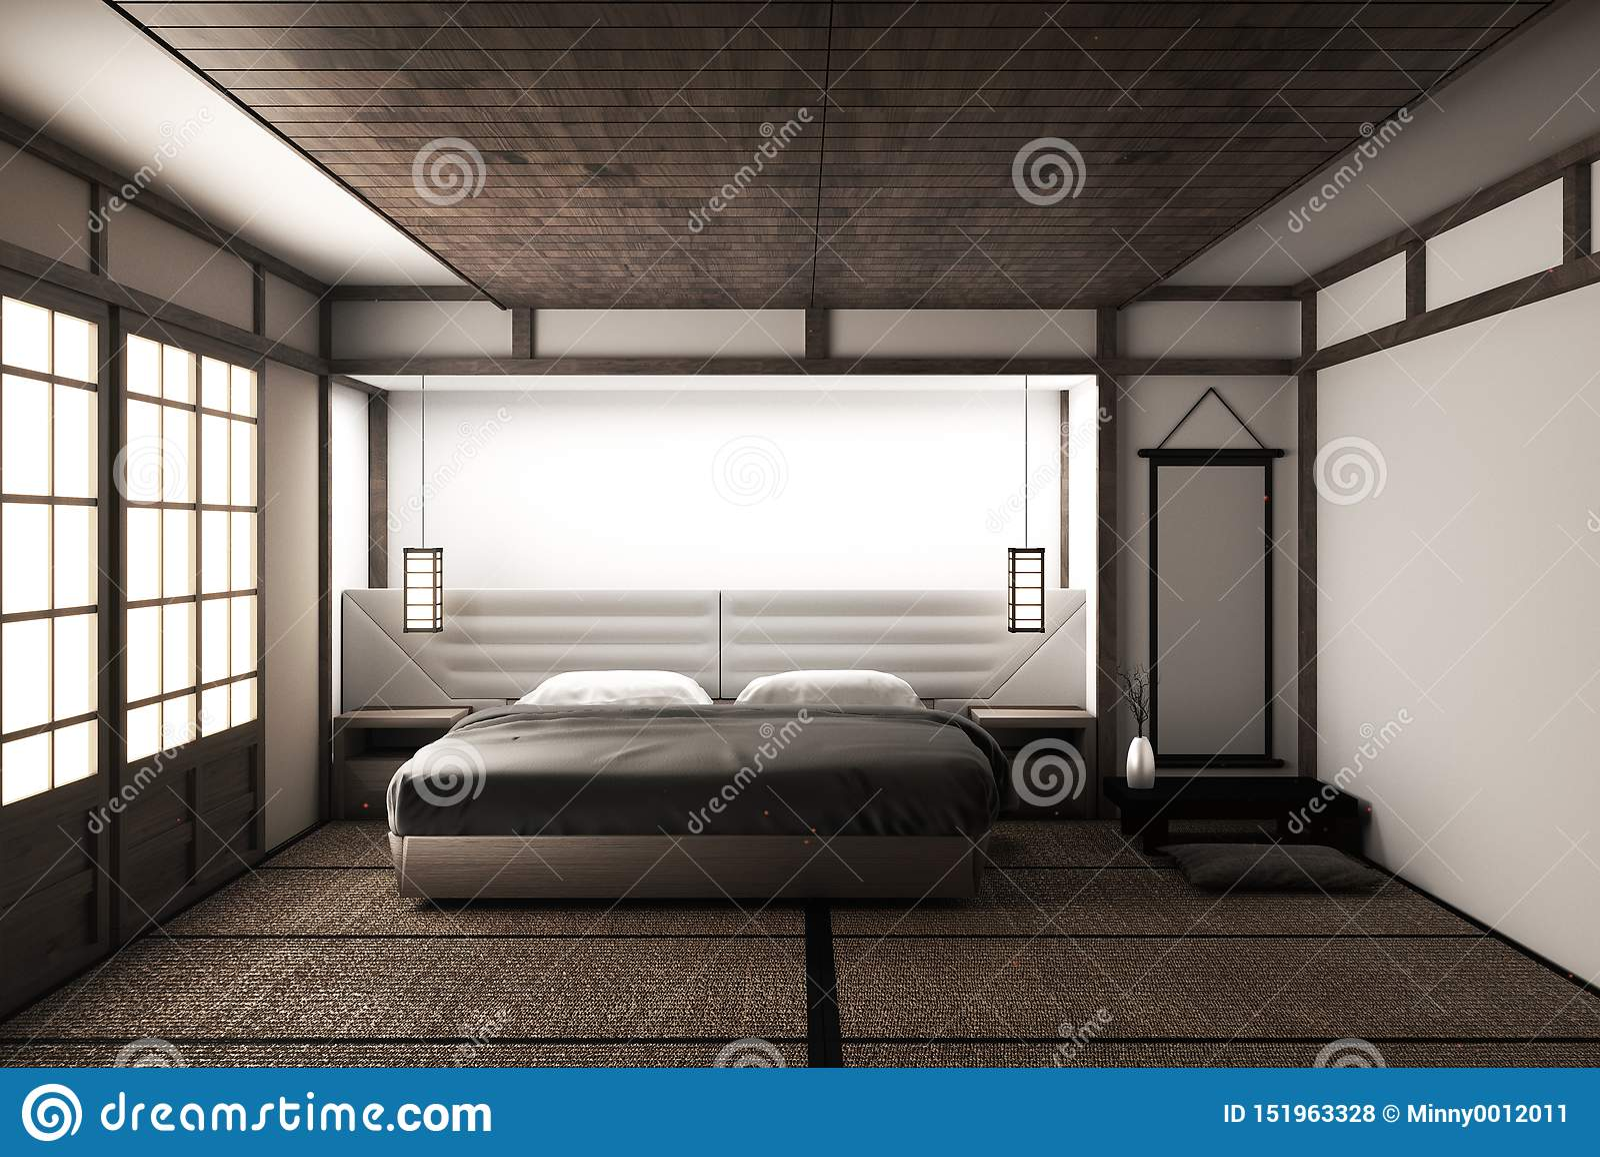 Japanese Bedroom Stock Illustrations – 12 Japanese Bedroom Stock